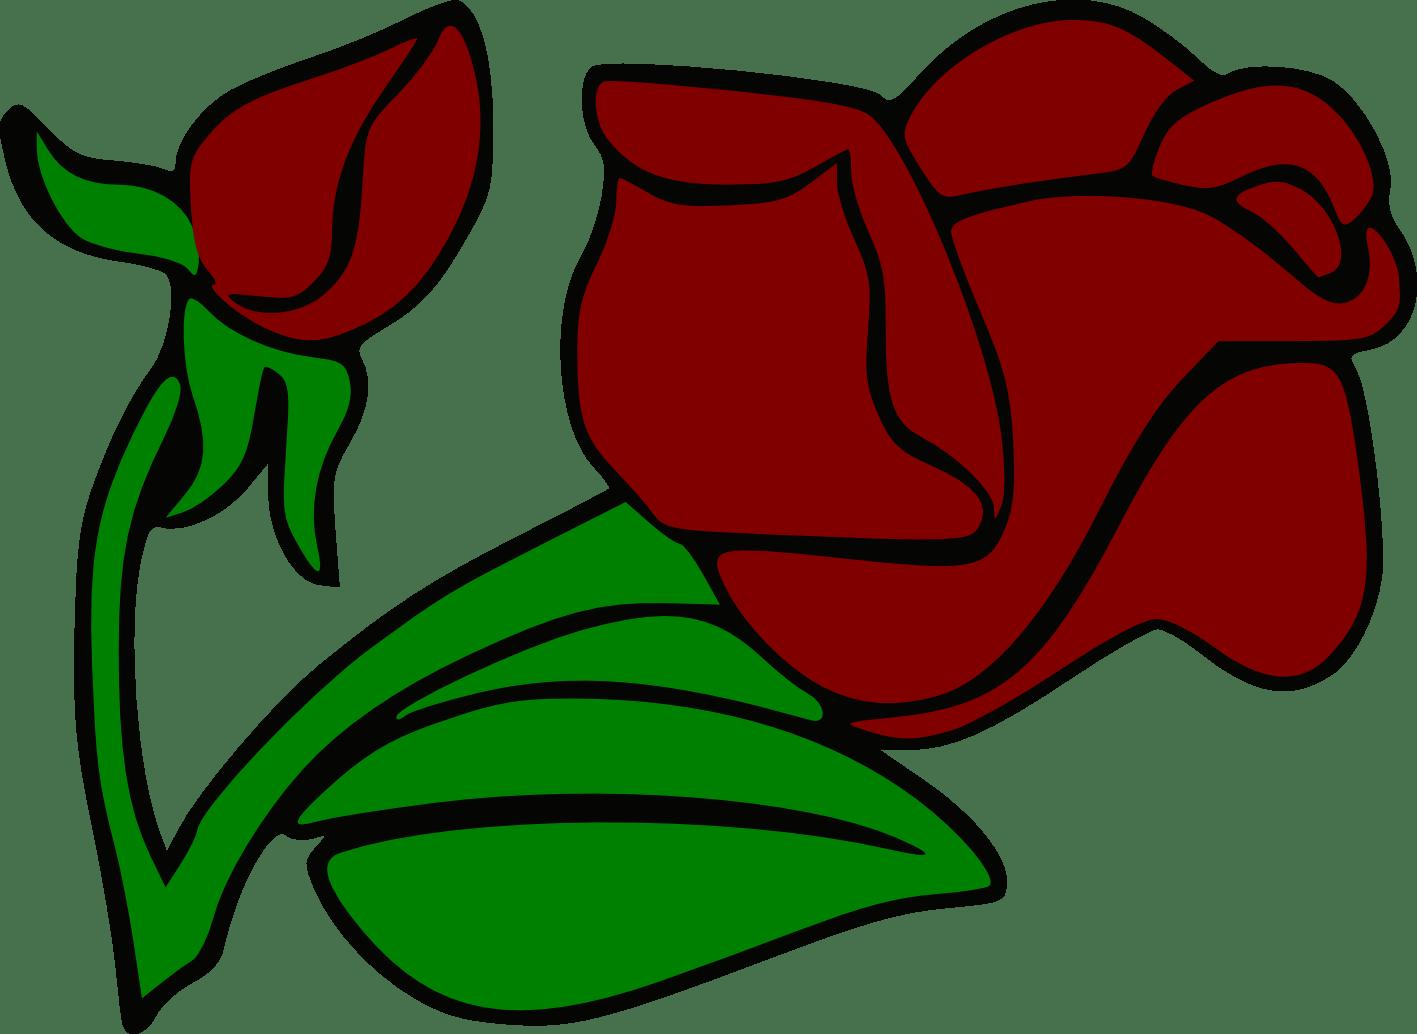 2 Roses SVG « My Cricut Scrapbooking